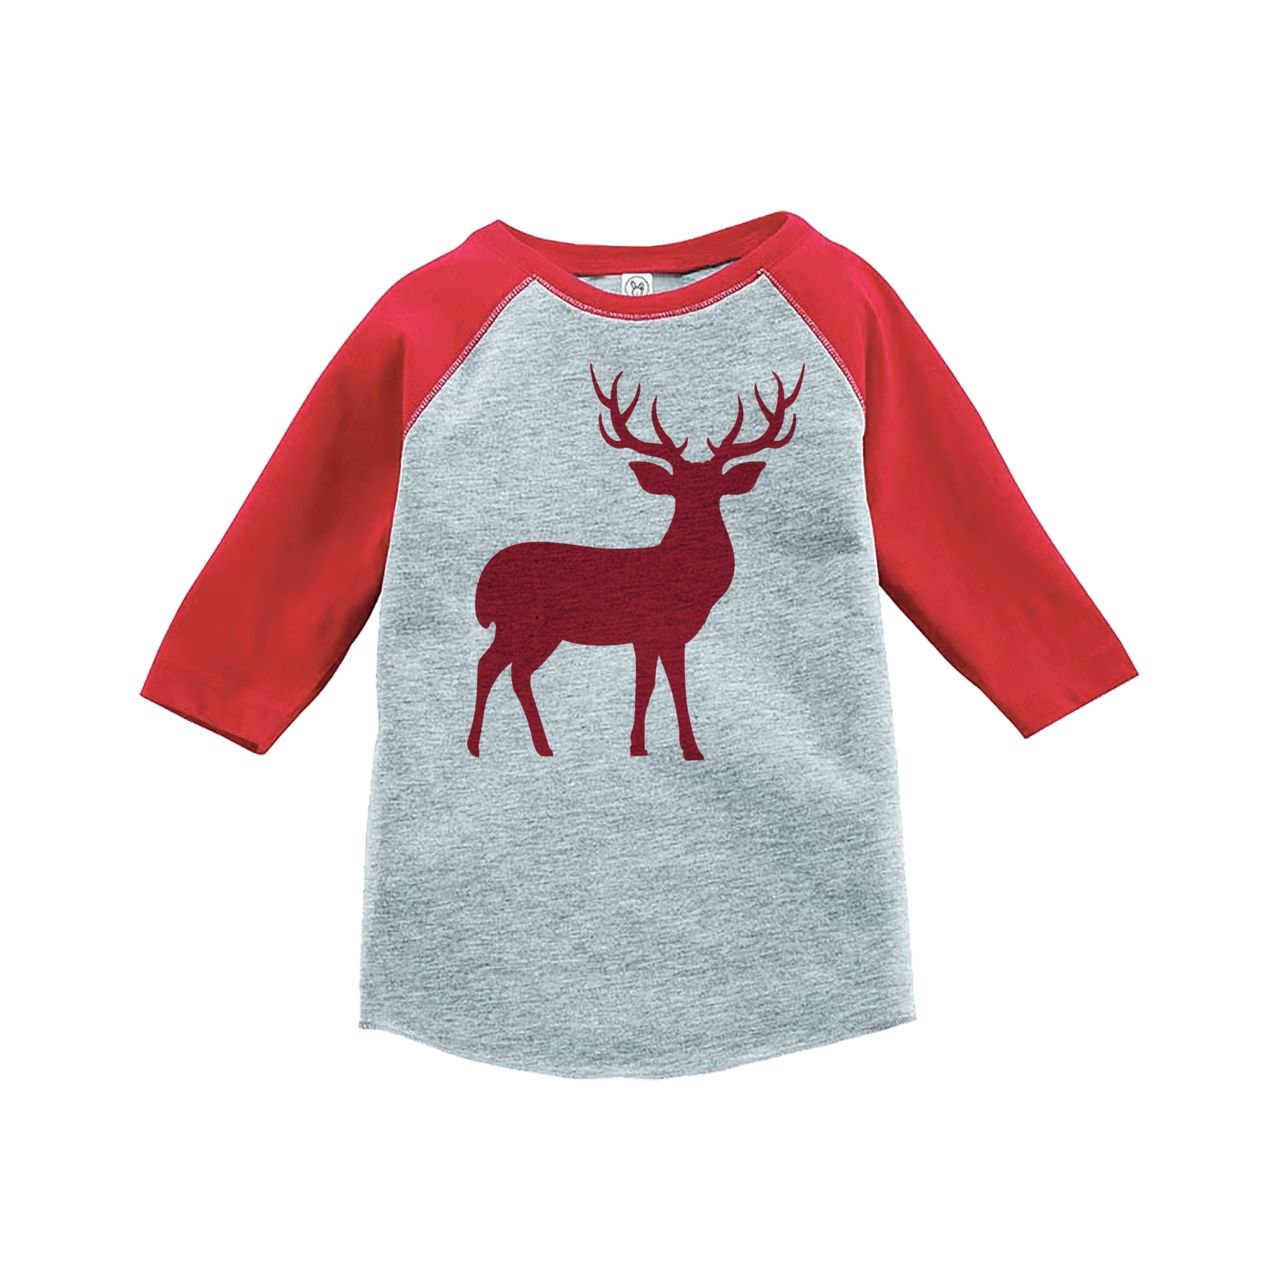 Custom Party Shop Youth Red Deer Christmas Raglan Shirt Red